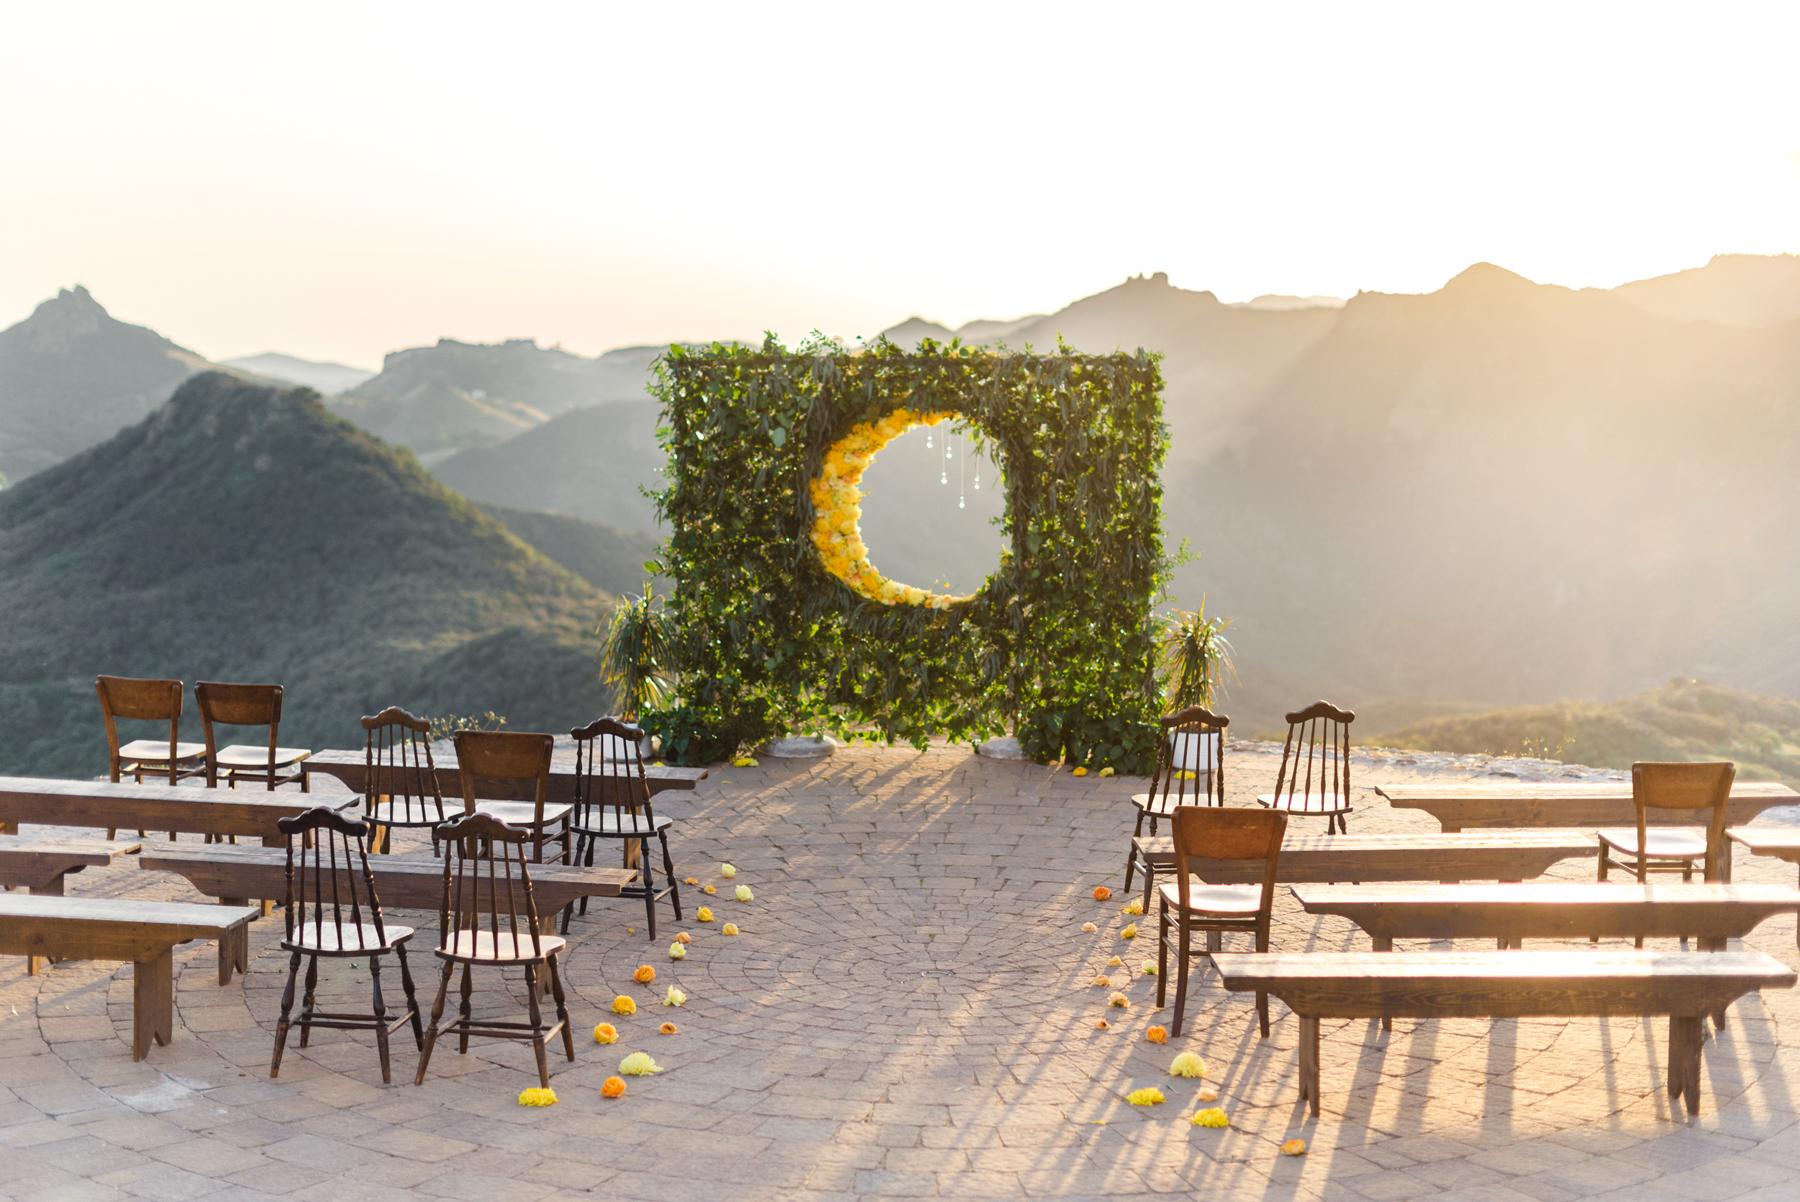 wedding plant wall greenery with circular cutout showcasing mountain range